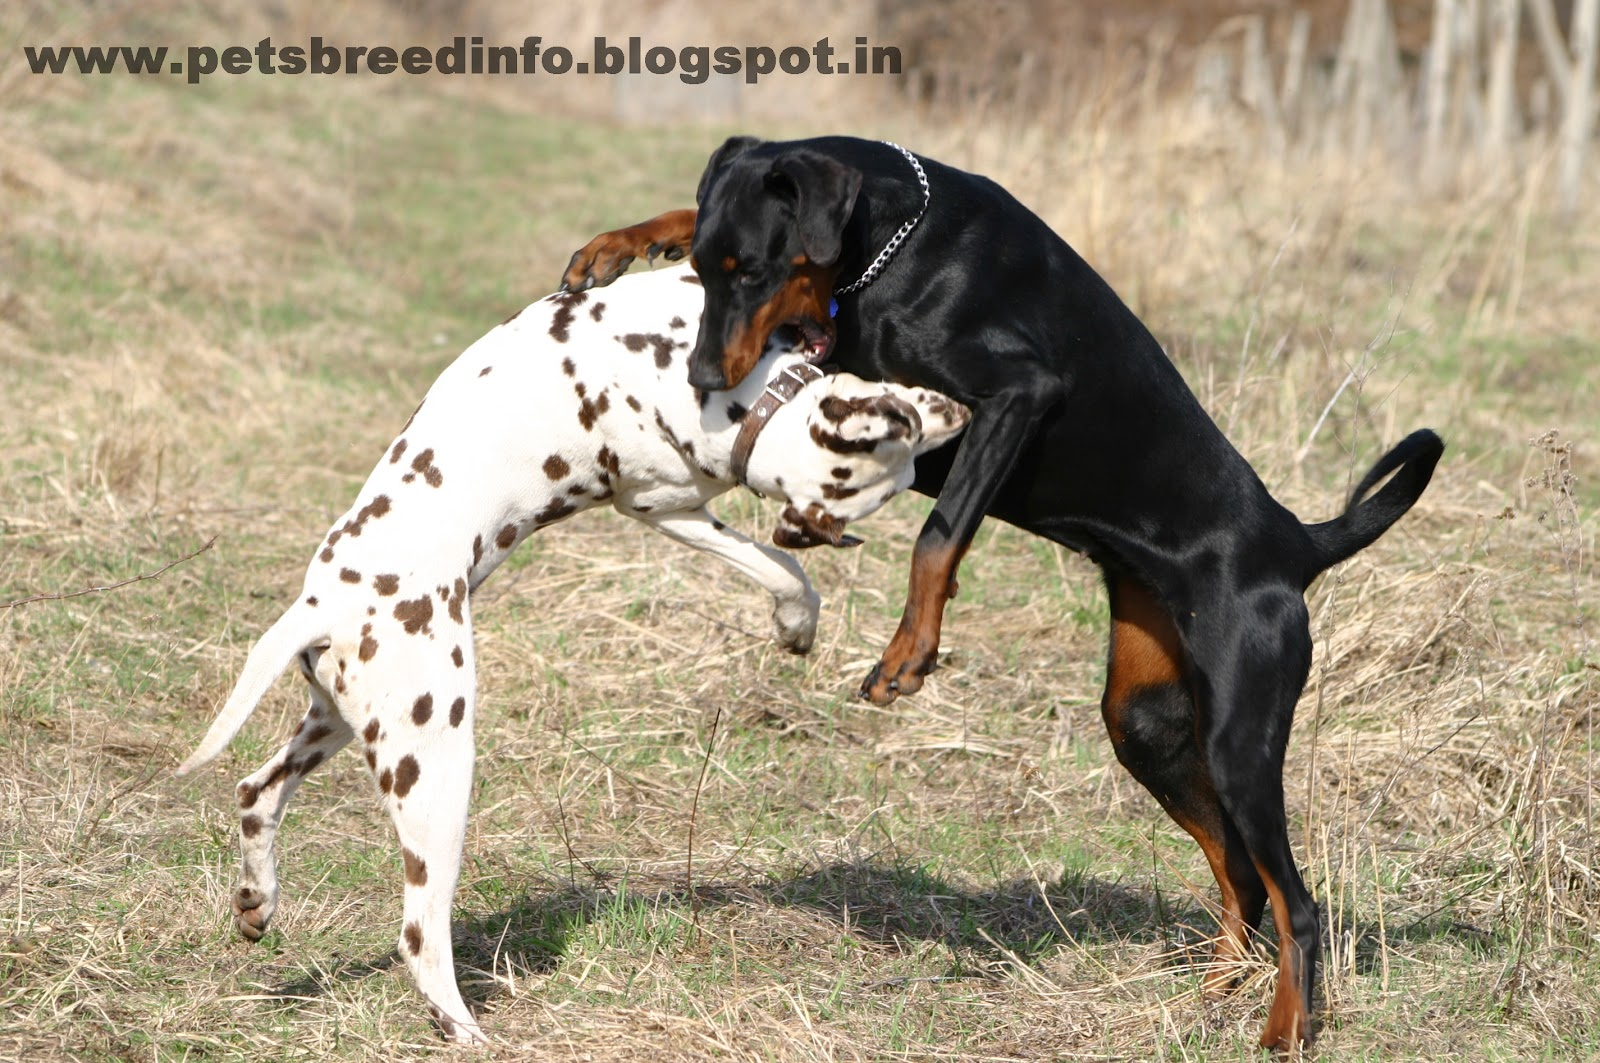 dalmatian dogs Dalmatian puppies for sale, dalmatian dogs for adoption and dalmatian dog breeders find the perfect dalmatian puppy at puppyfindcom.